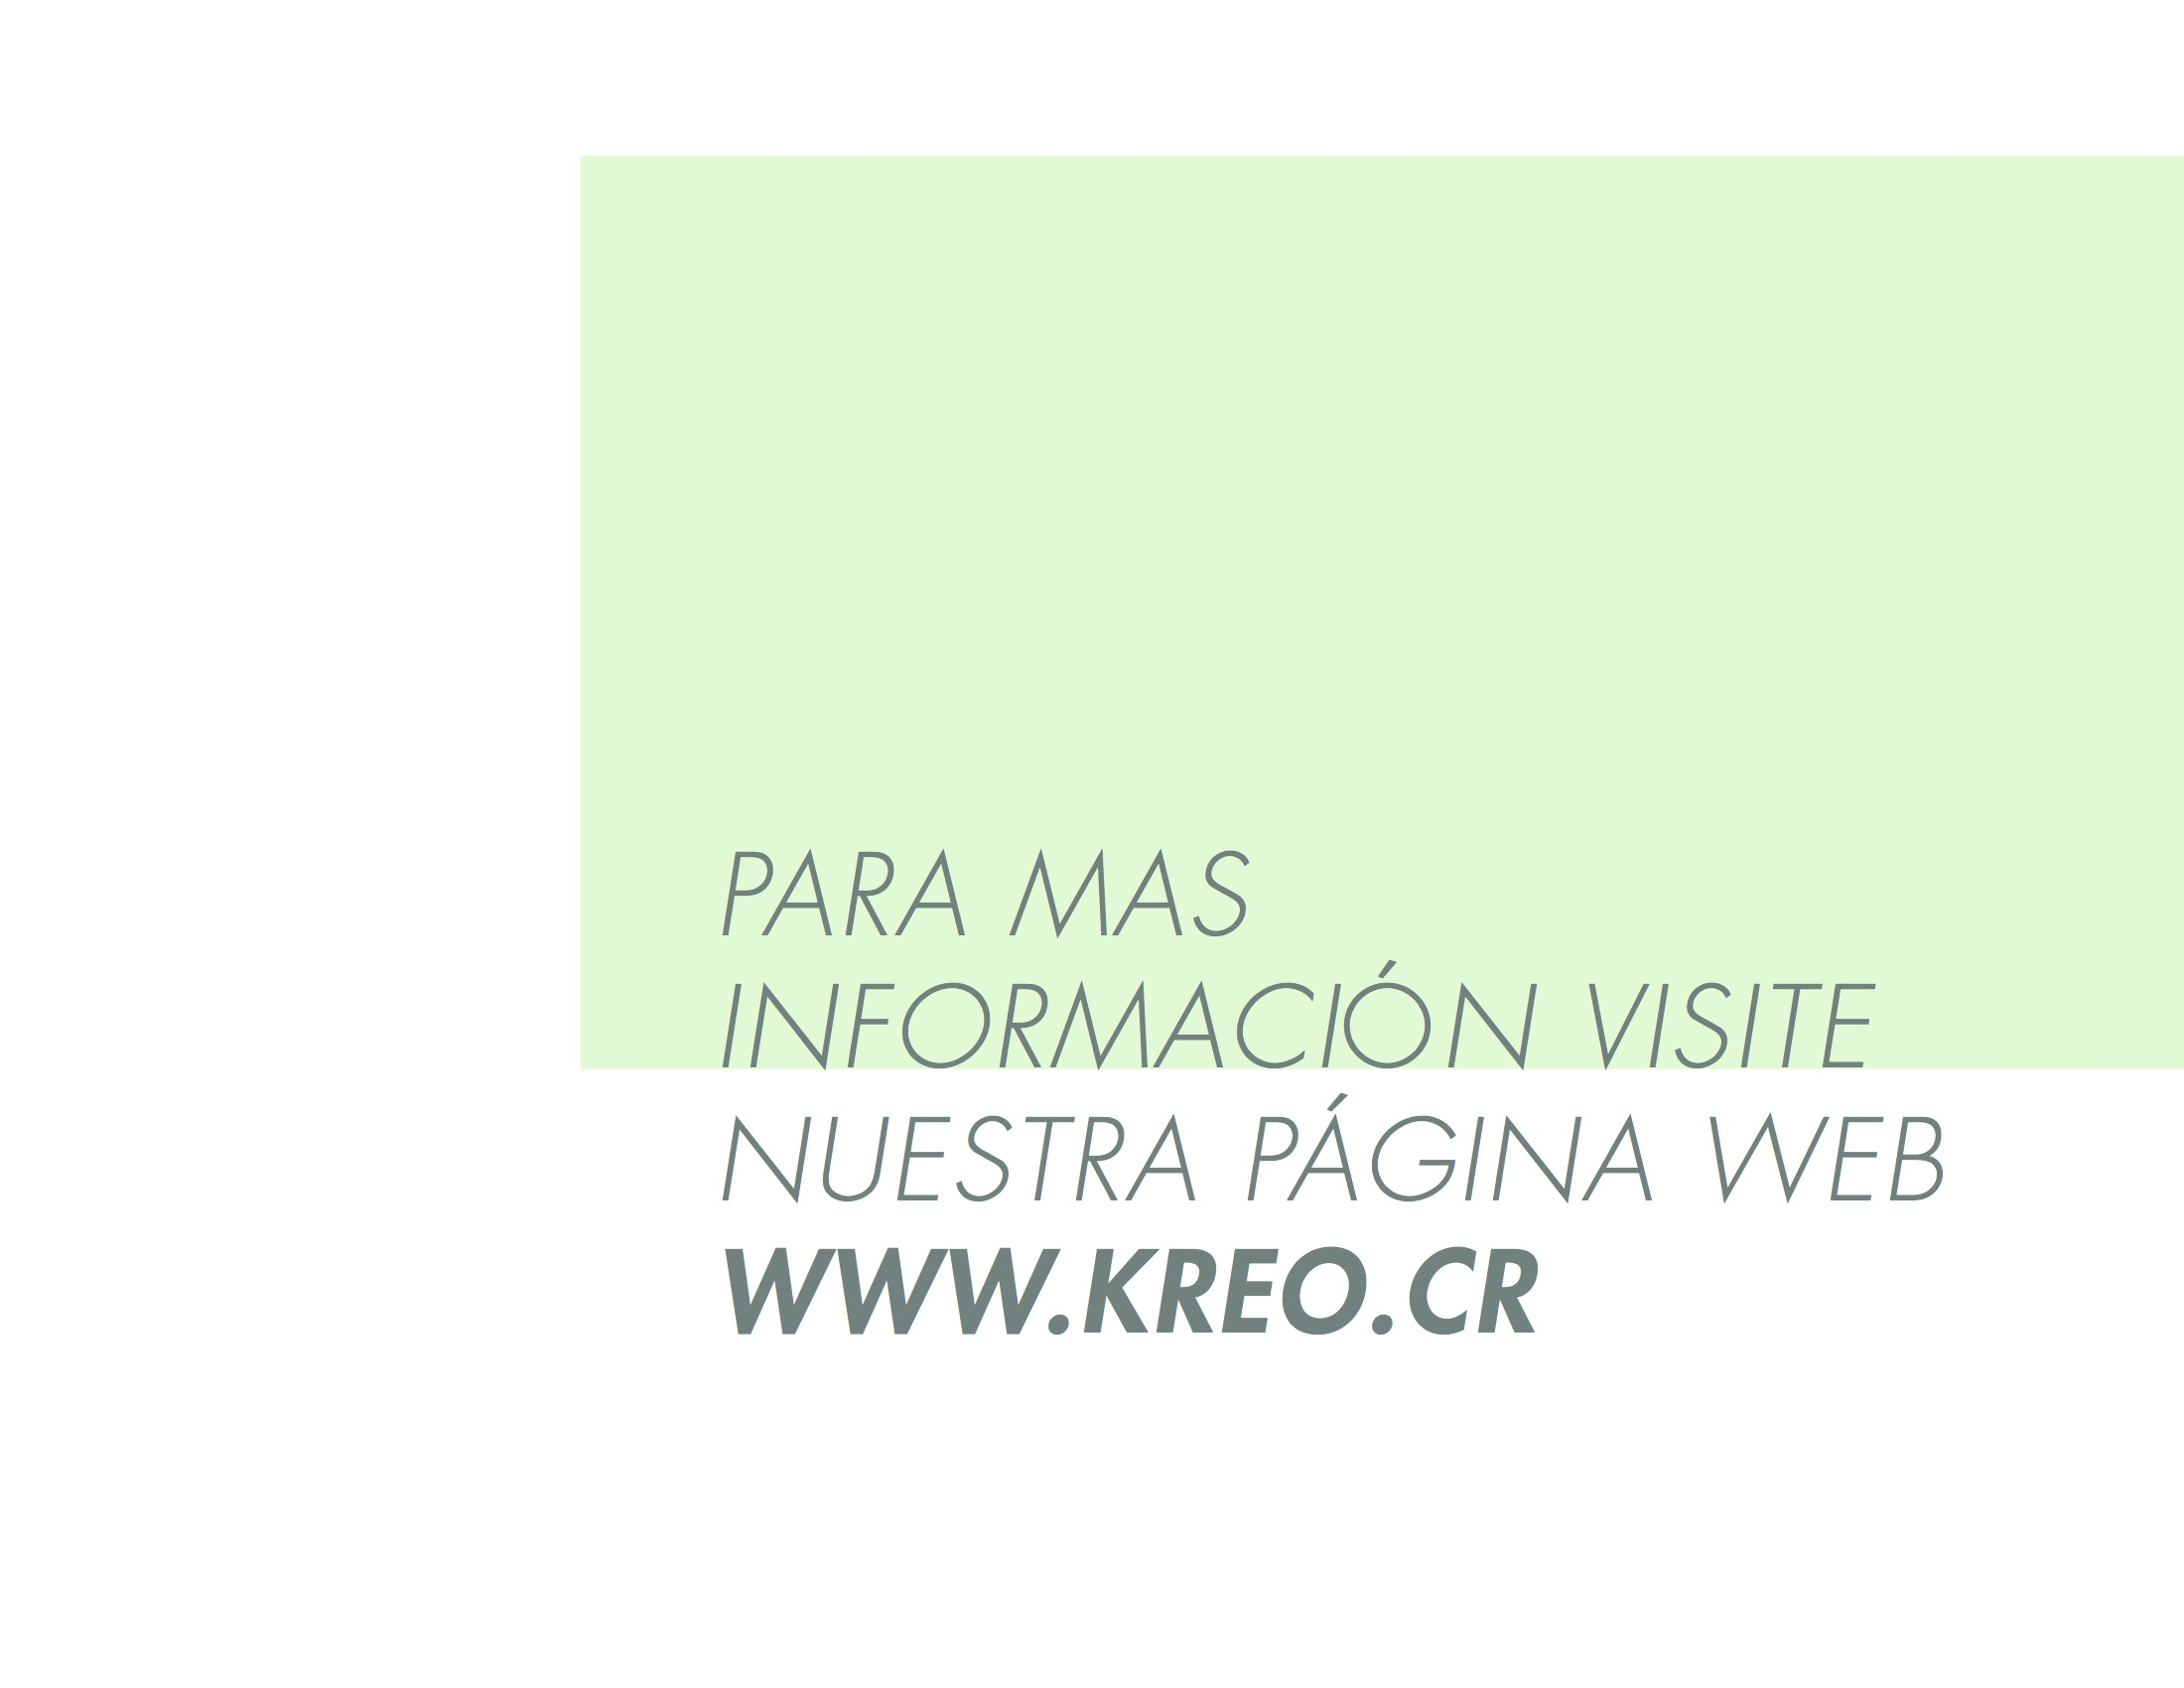 KREO_PRESENTACION16.jpg